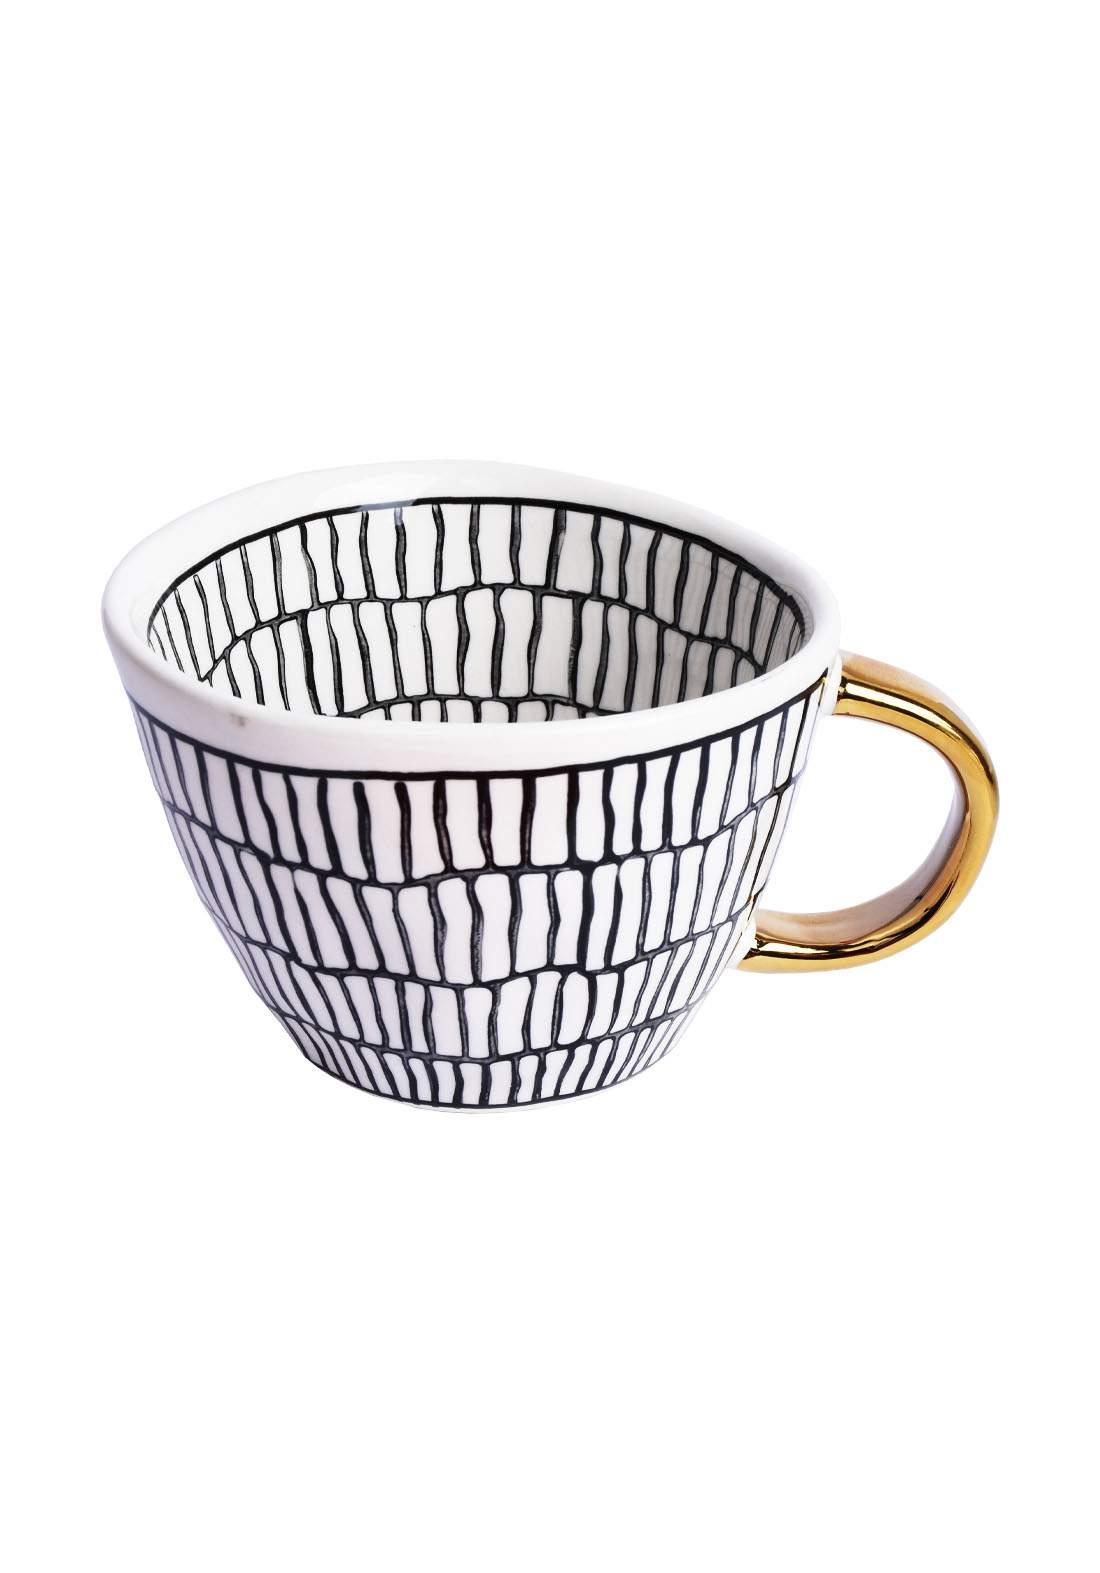 Handmade Mugs With Gold Handle كوب بمقبض ذهبي